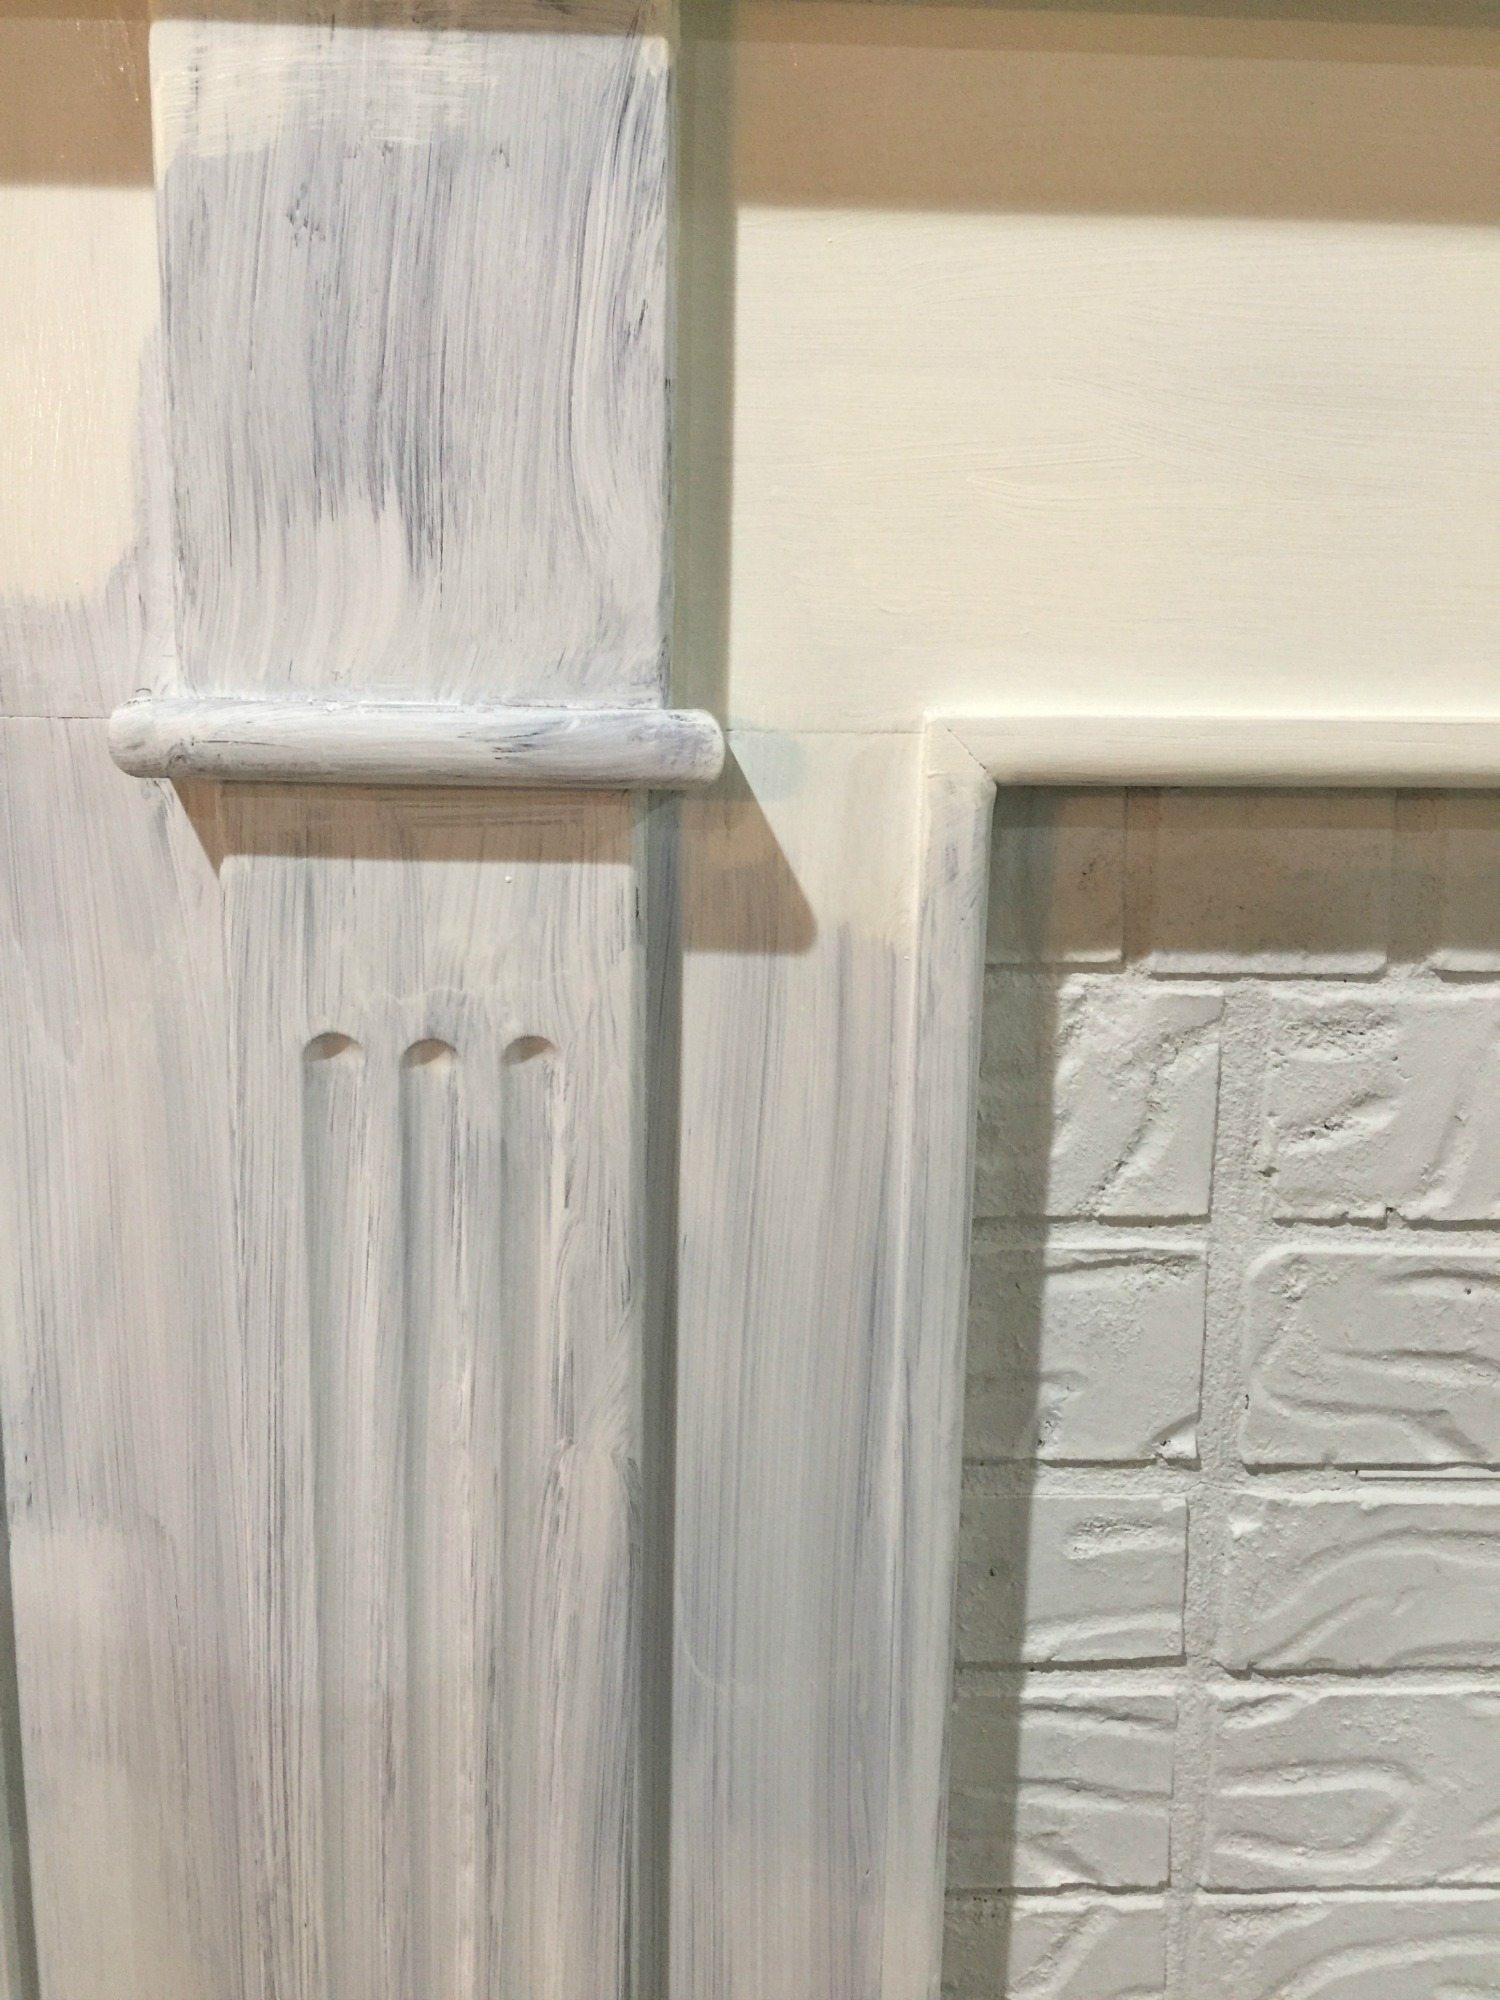 One coat of primer